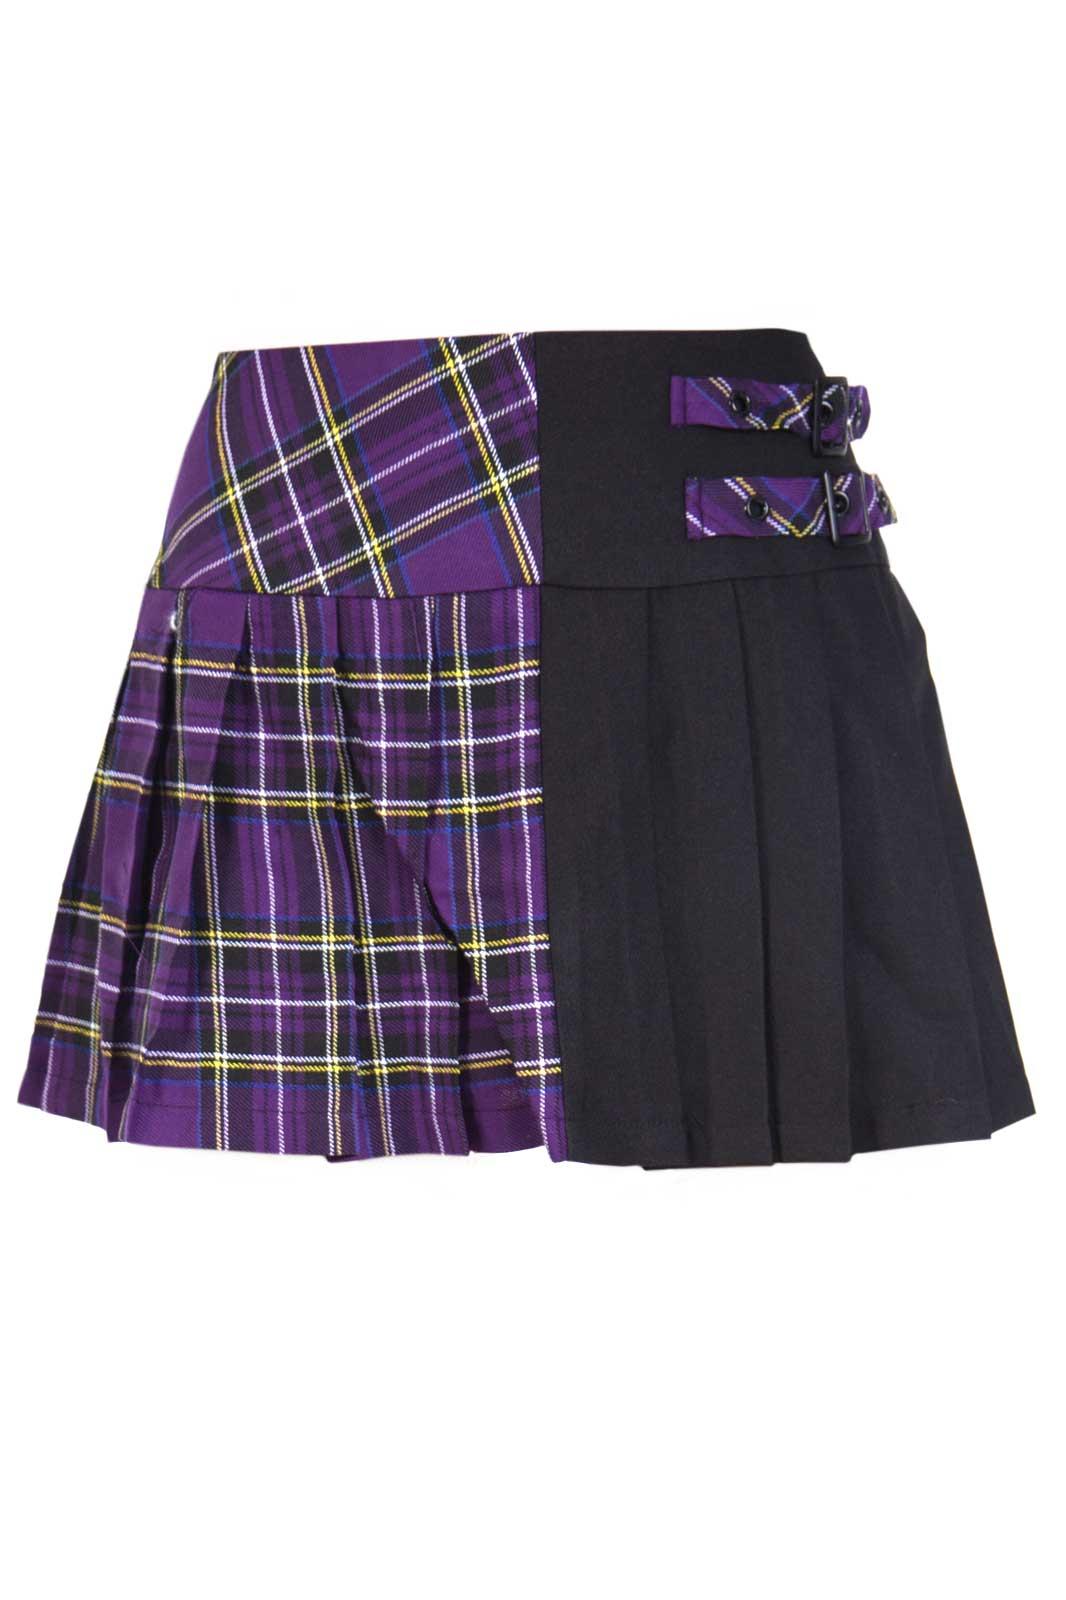 Köp Banned Tartan Split Mini Skirt Purple (299 kr) hos Shock